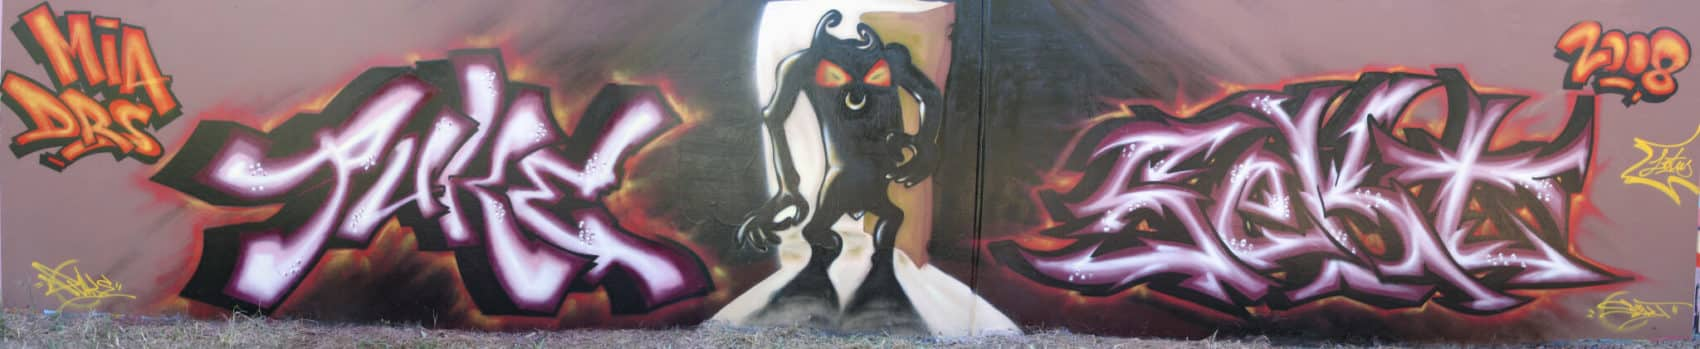 Sydney graffiti artist puke